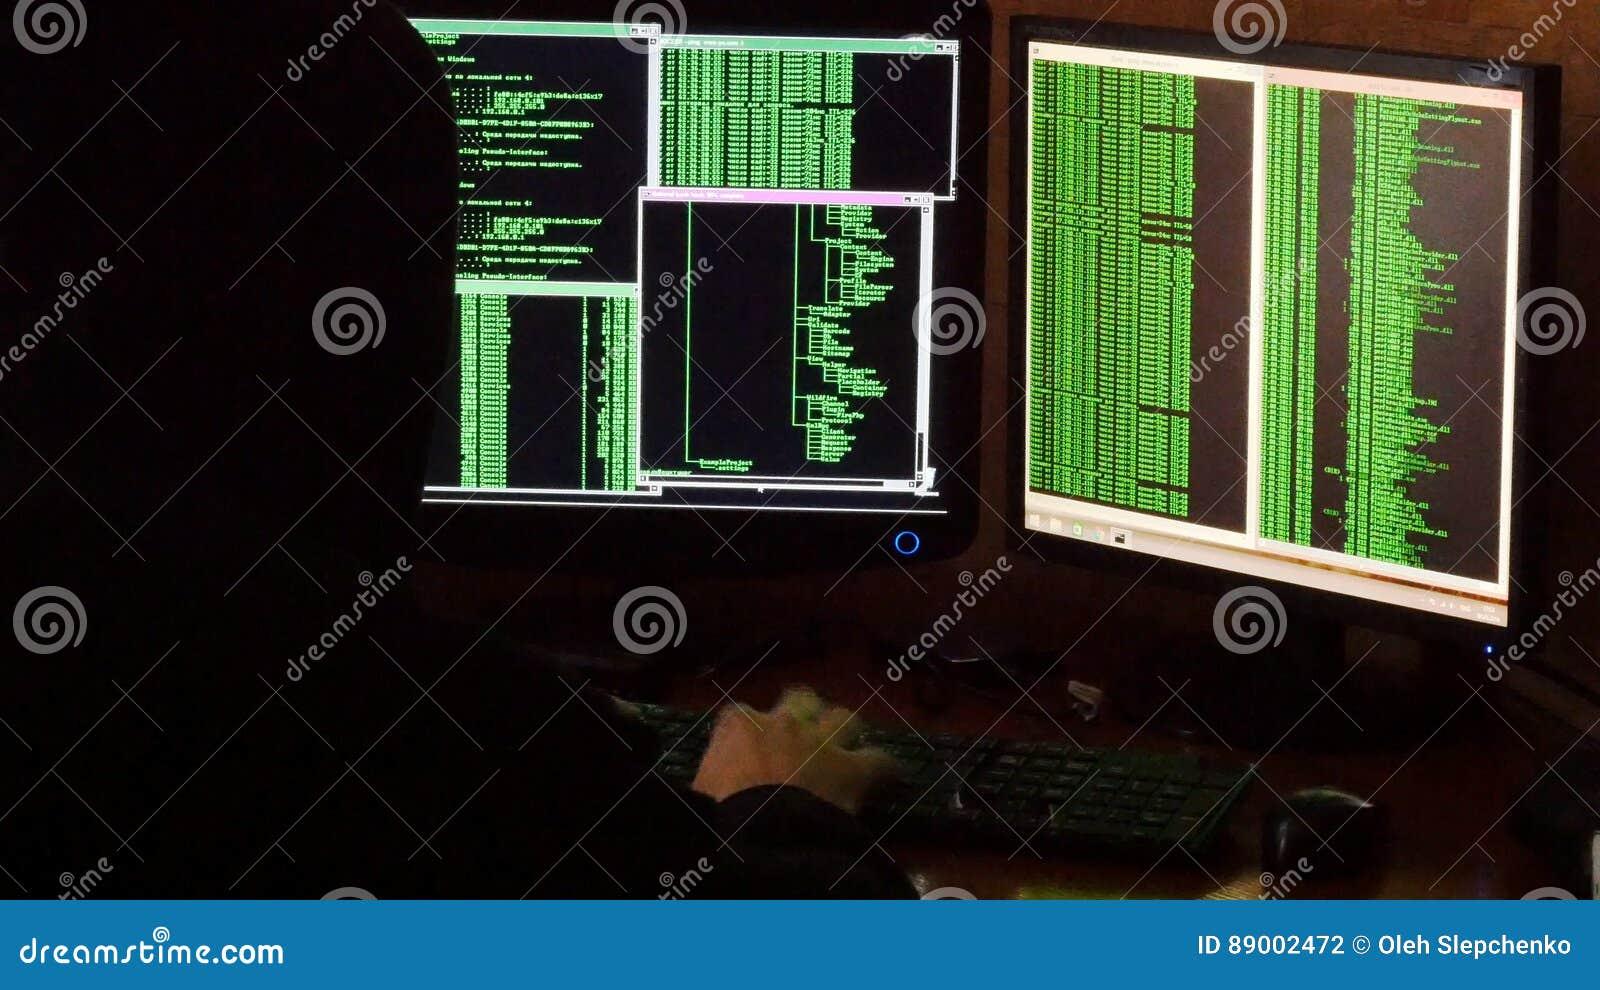 Hacker breaking code. Criminal hacker with black hood penetrating network system from his dark hacker room.